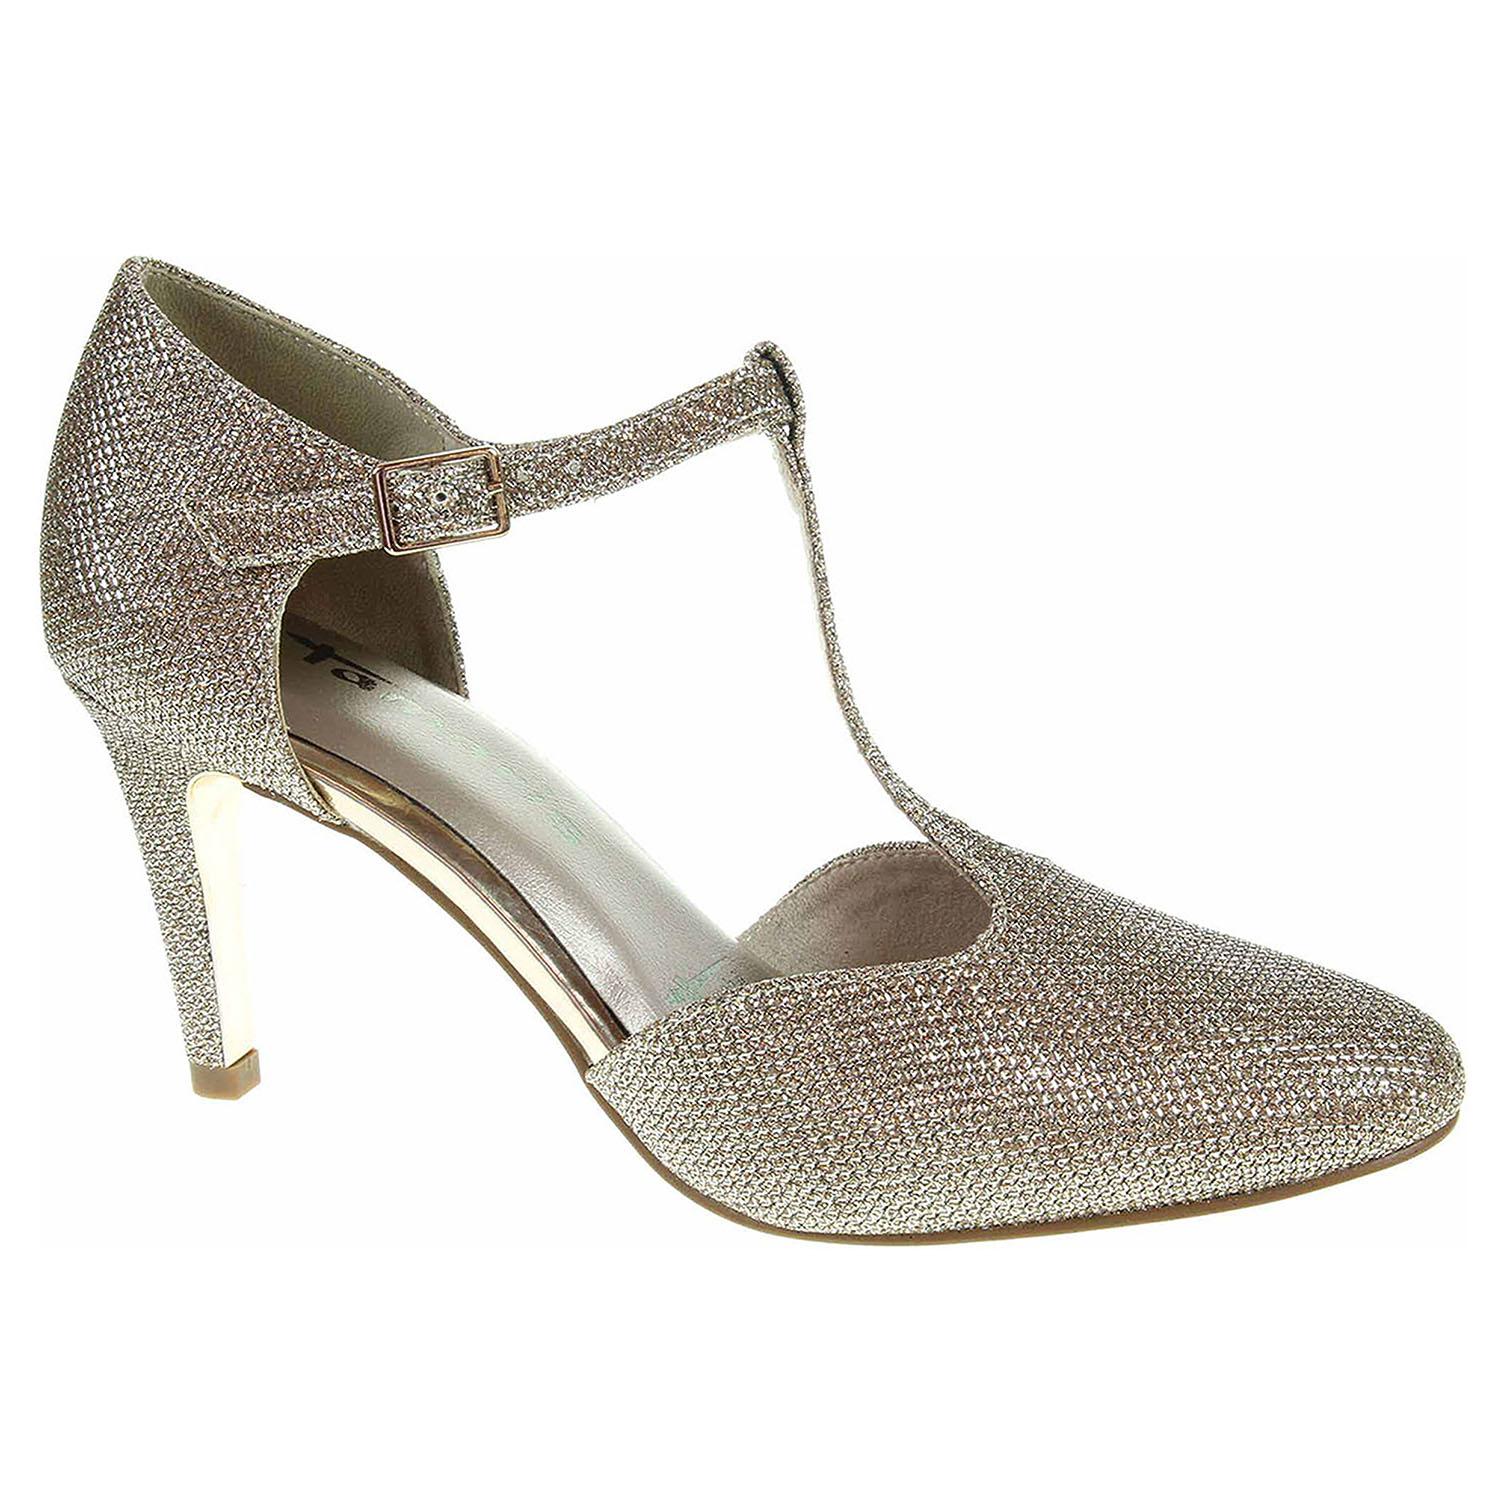 c40cf01e282e detail Dámska spoločenské topánky Tamaris 1-24438-39 zlaté